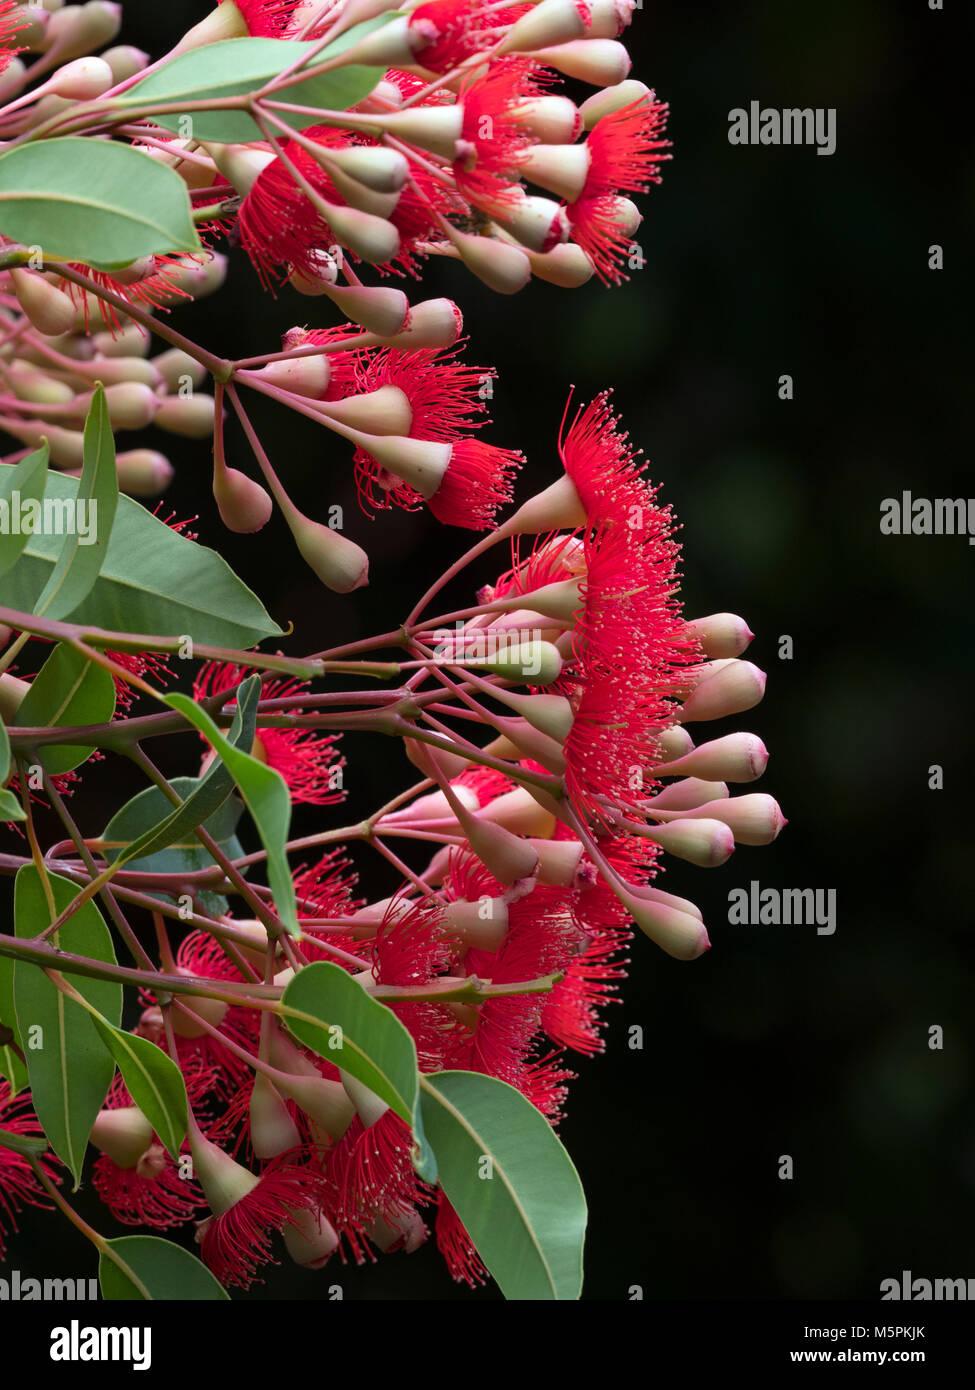 Flowering Gum Trees Stock Photos & Flowering Gum Trees Stock Images ...